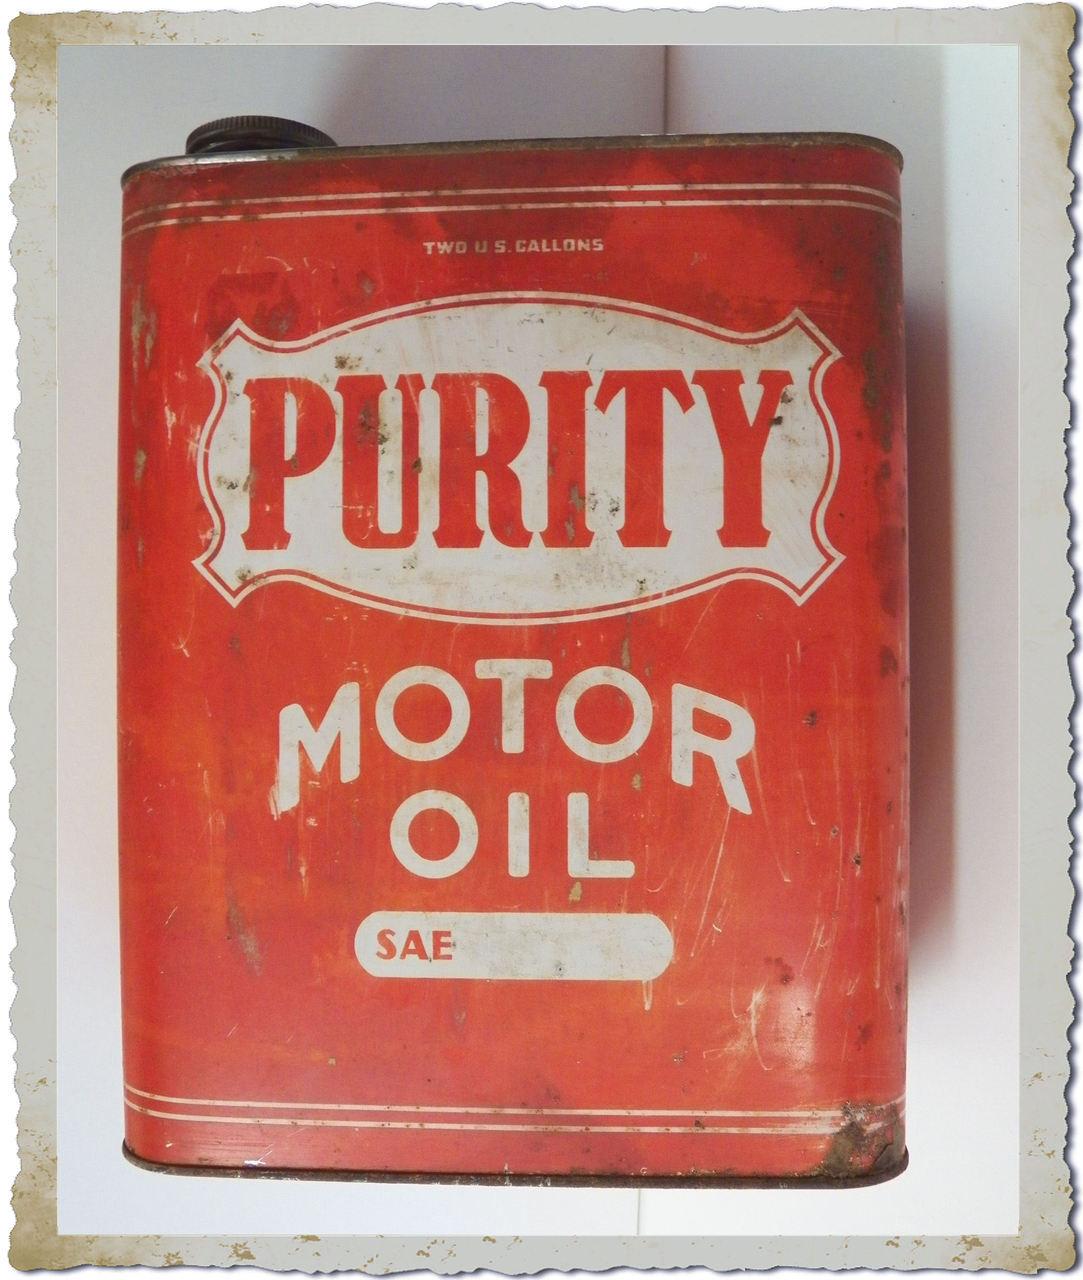 Purity 2 gallon motor oil can bingo 39 s swap meet garage for Gallon of motor oil price